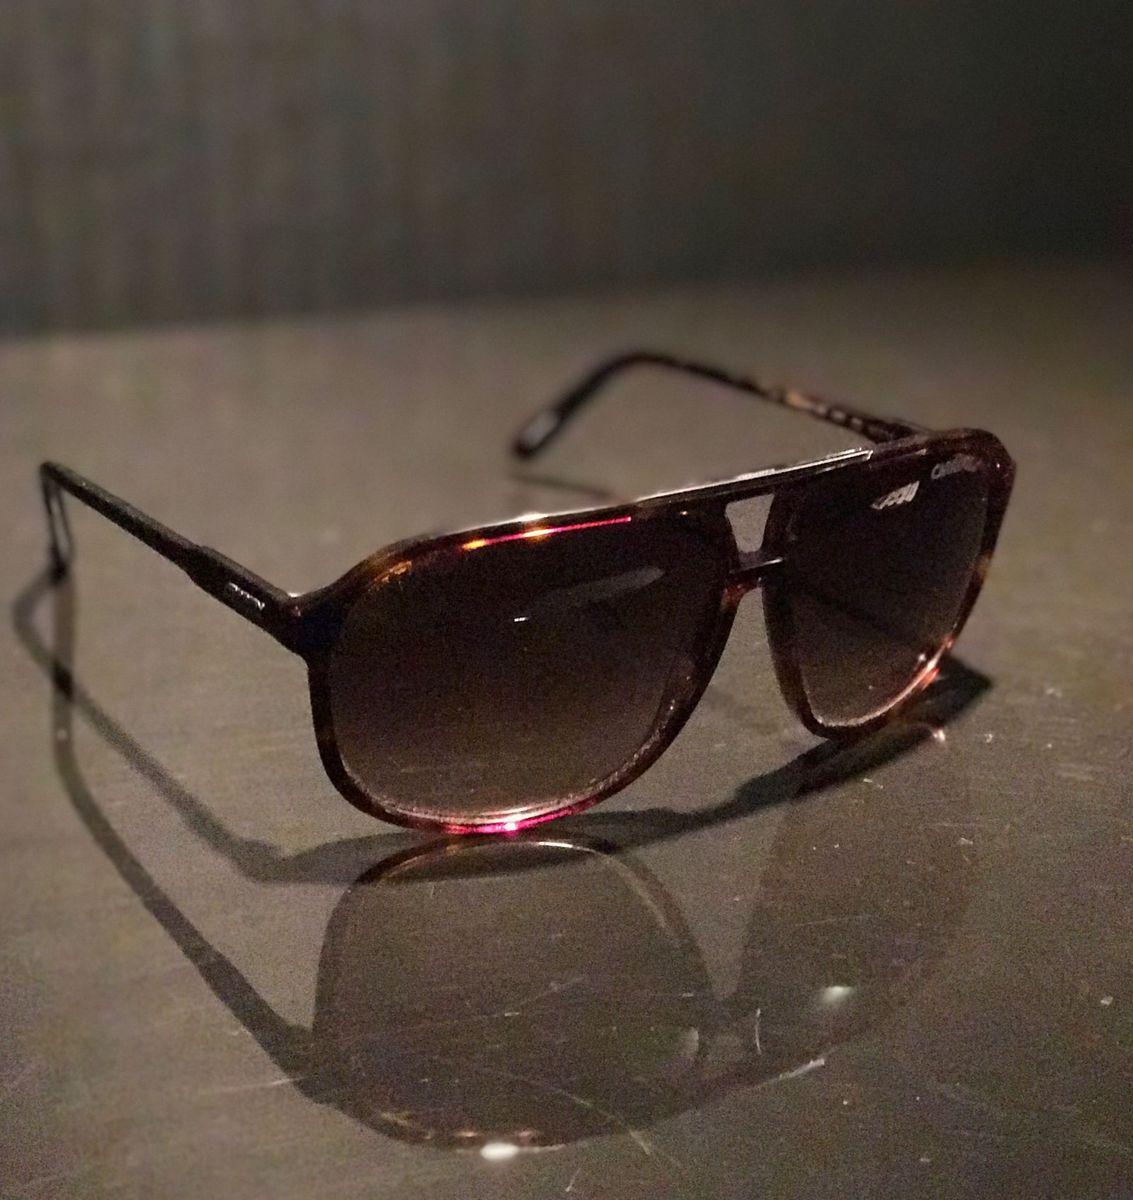 bbef391aa223a óculos de sol carreira - óculos carreira.  Czm6ly9wag90b3muzw5qb2vplmnvbs5ici9wcm9kdwn0cy81otq1ny9injnhogjjmmi1nmmyndzhyzq2mjuzmzm2mdjhy2qwms5qcgc  ...